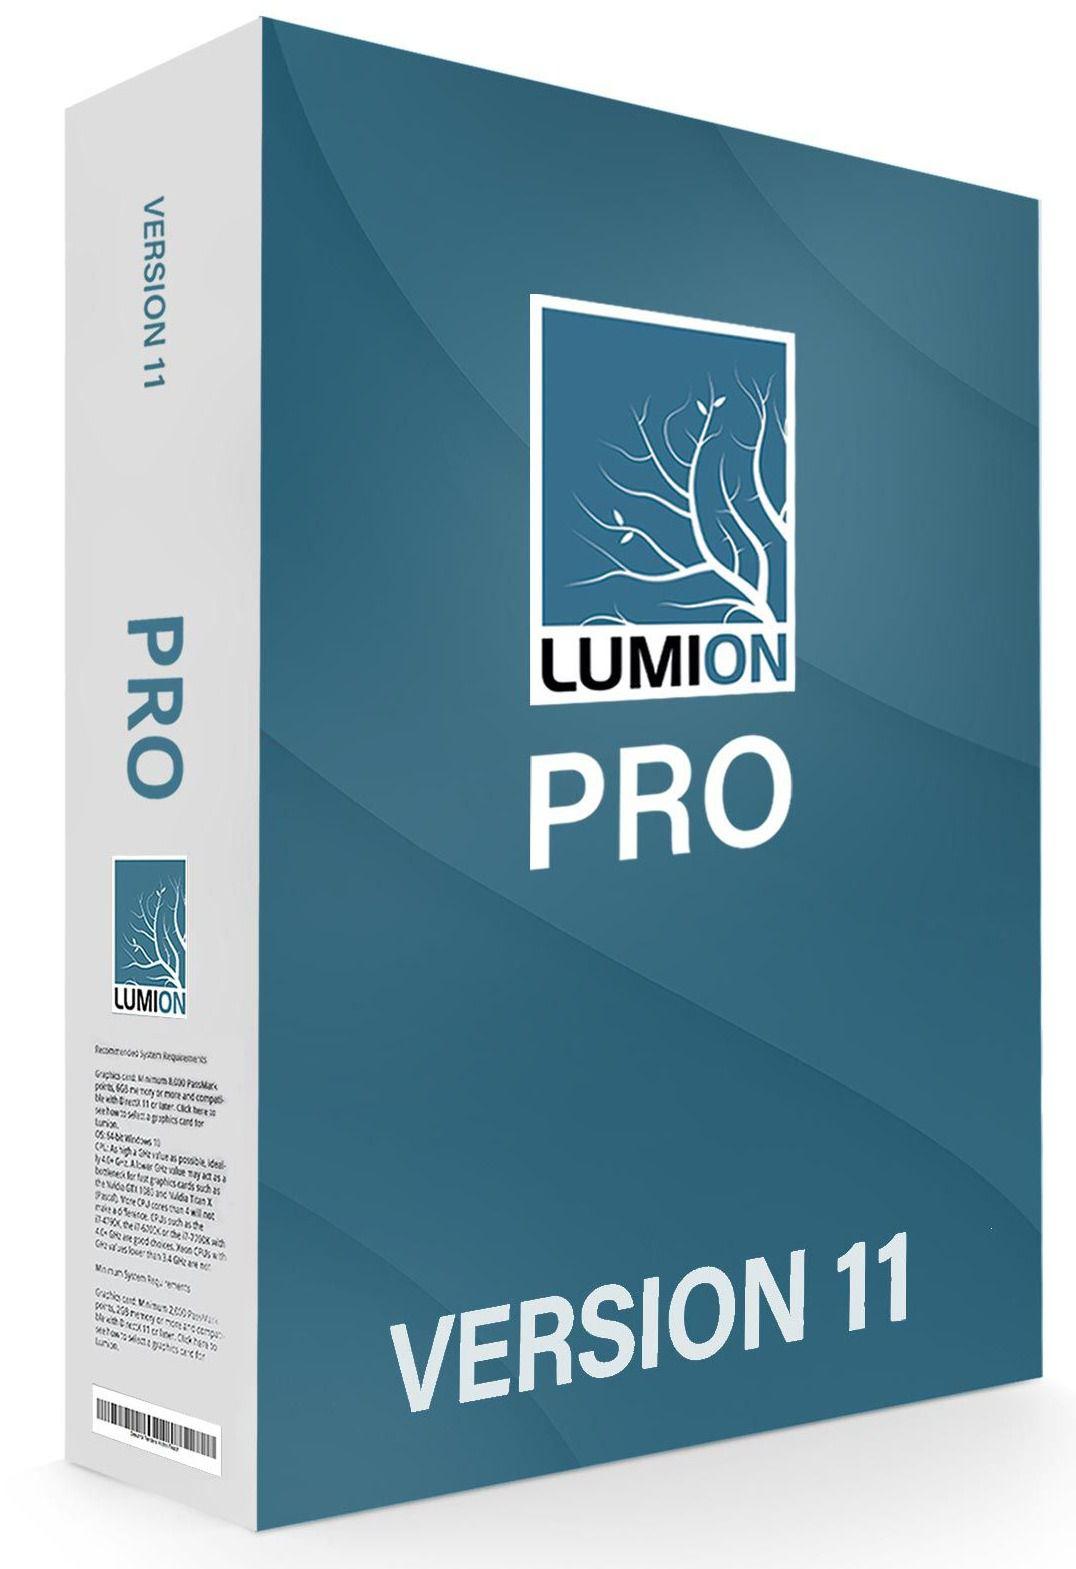 Lumion 10.5 Pro